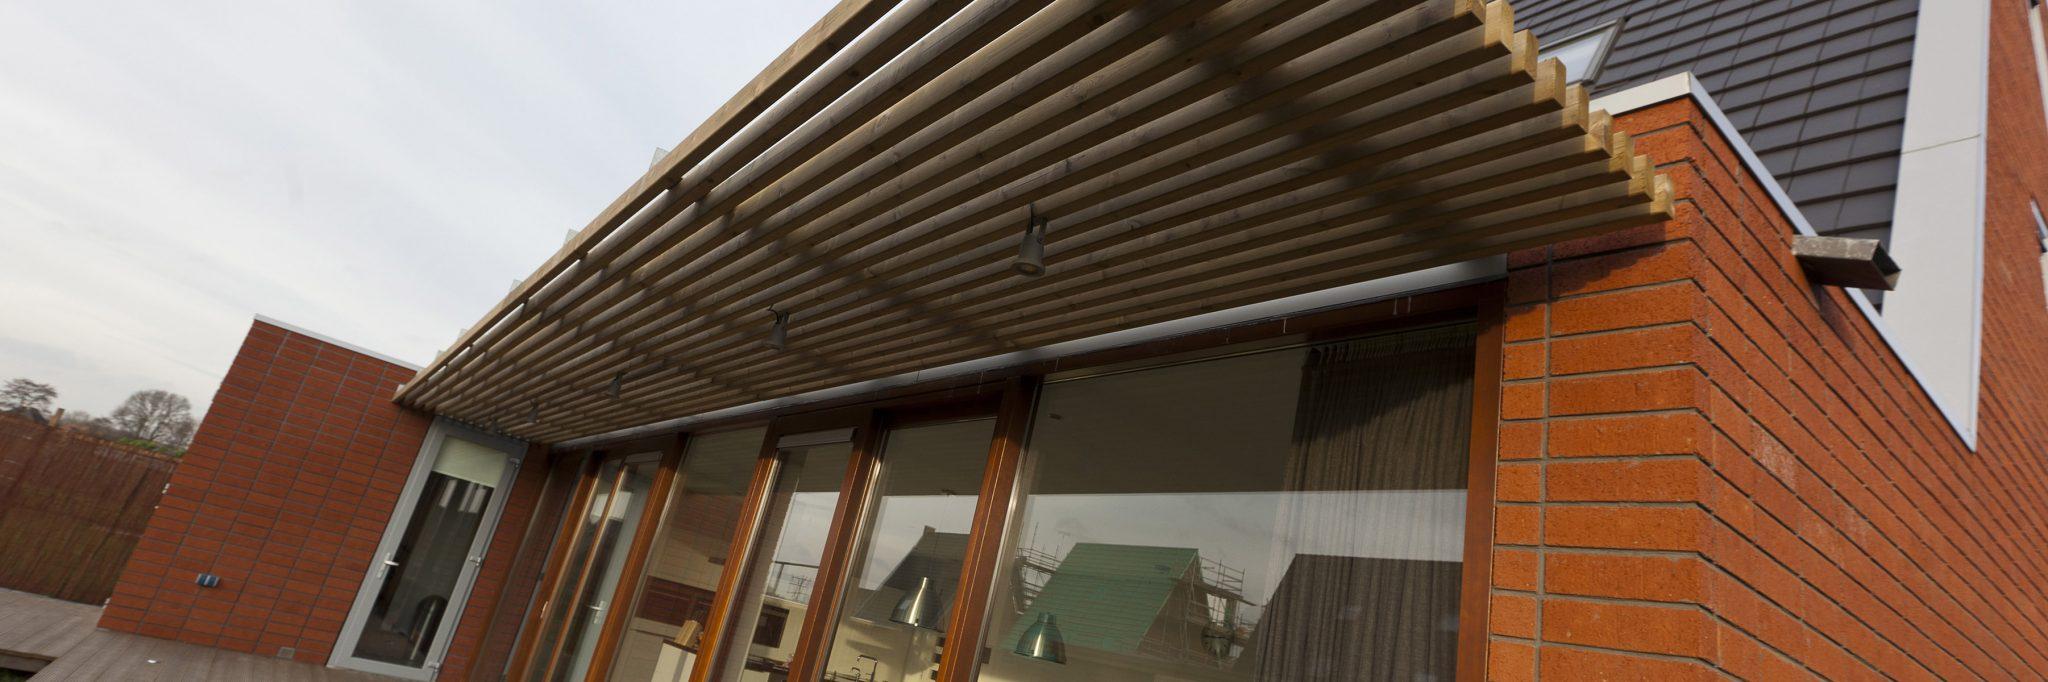 Duurzame architectuur nieuwbouwwoning Friesland